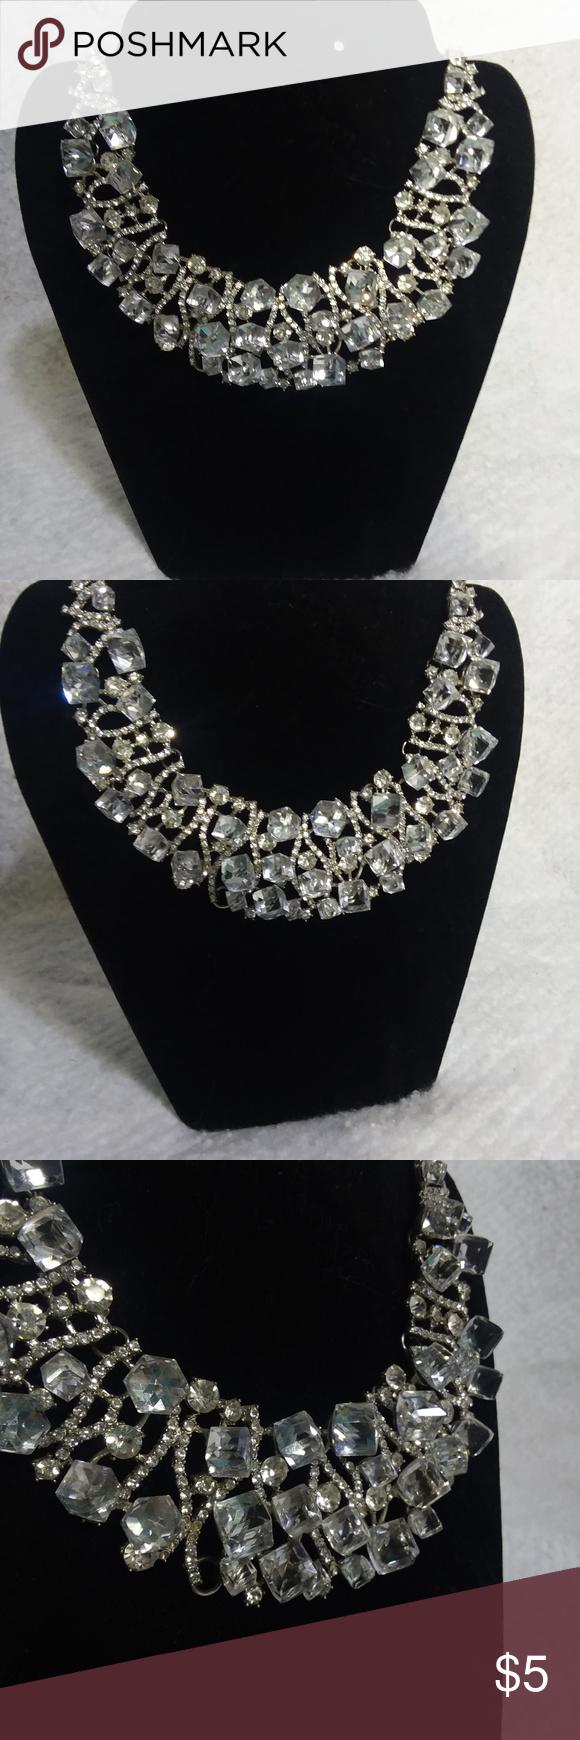 5/25 chunky bling necklace Bling necklace, Bling